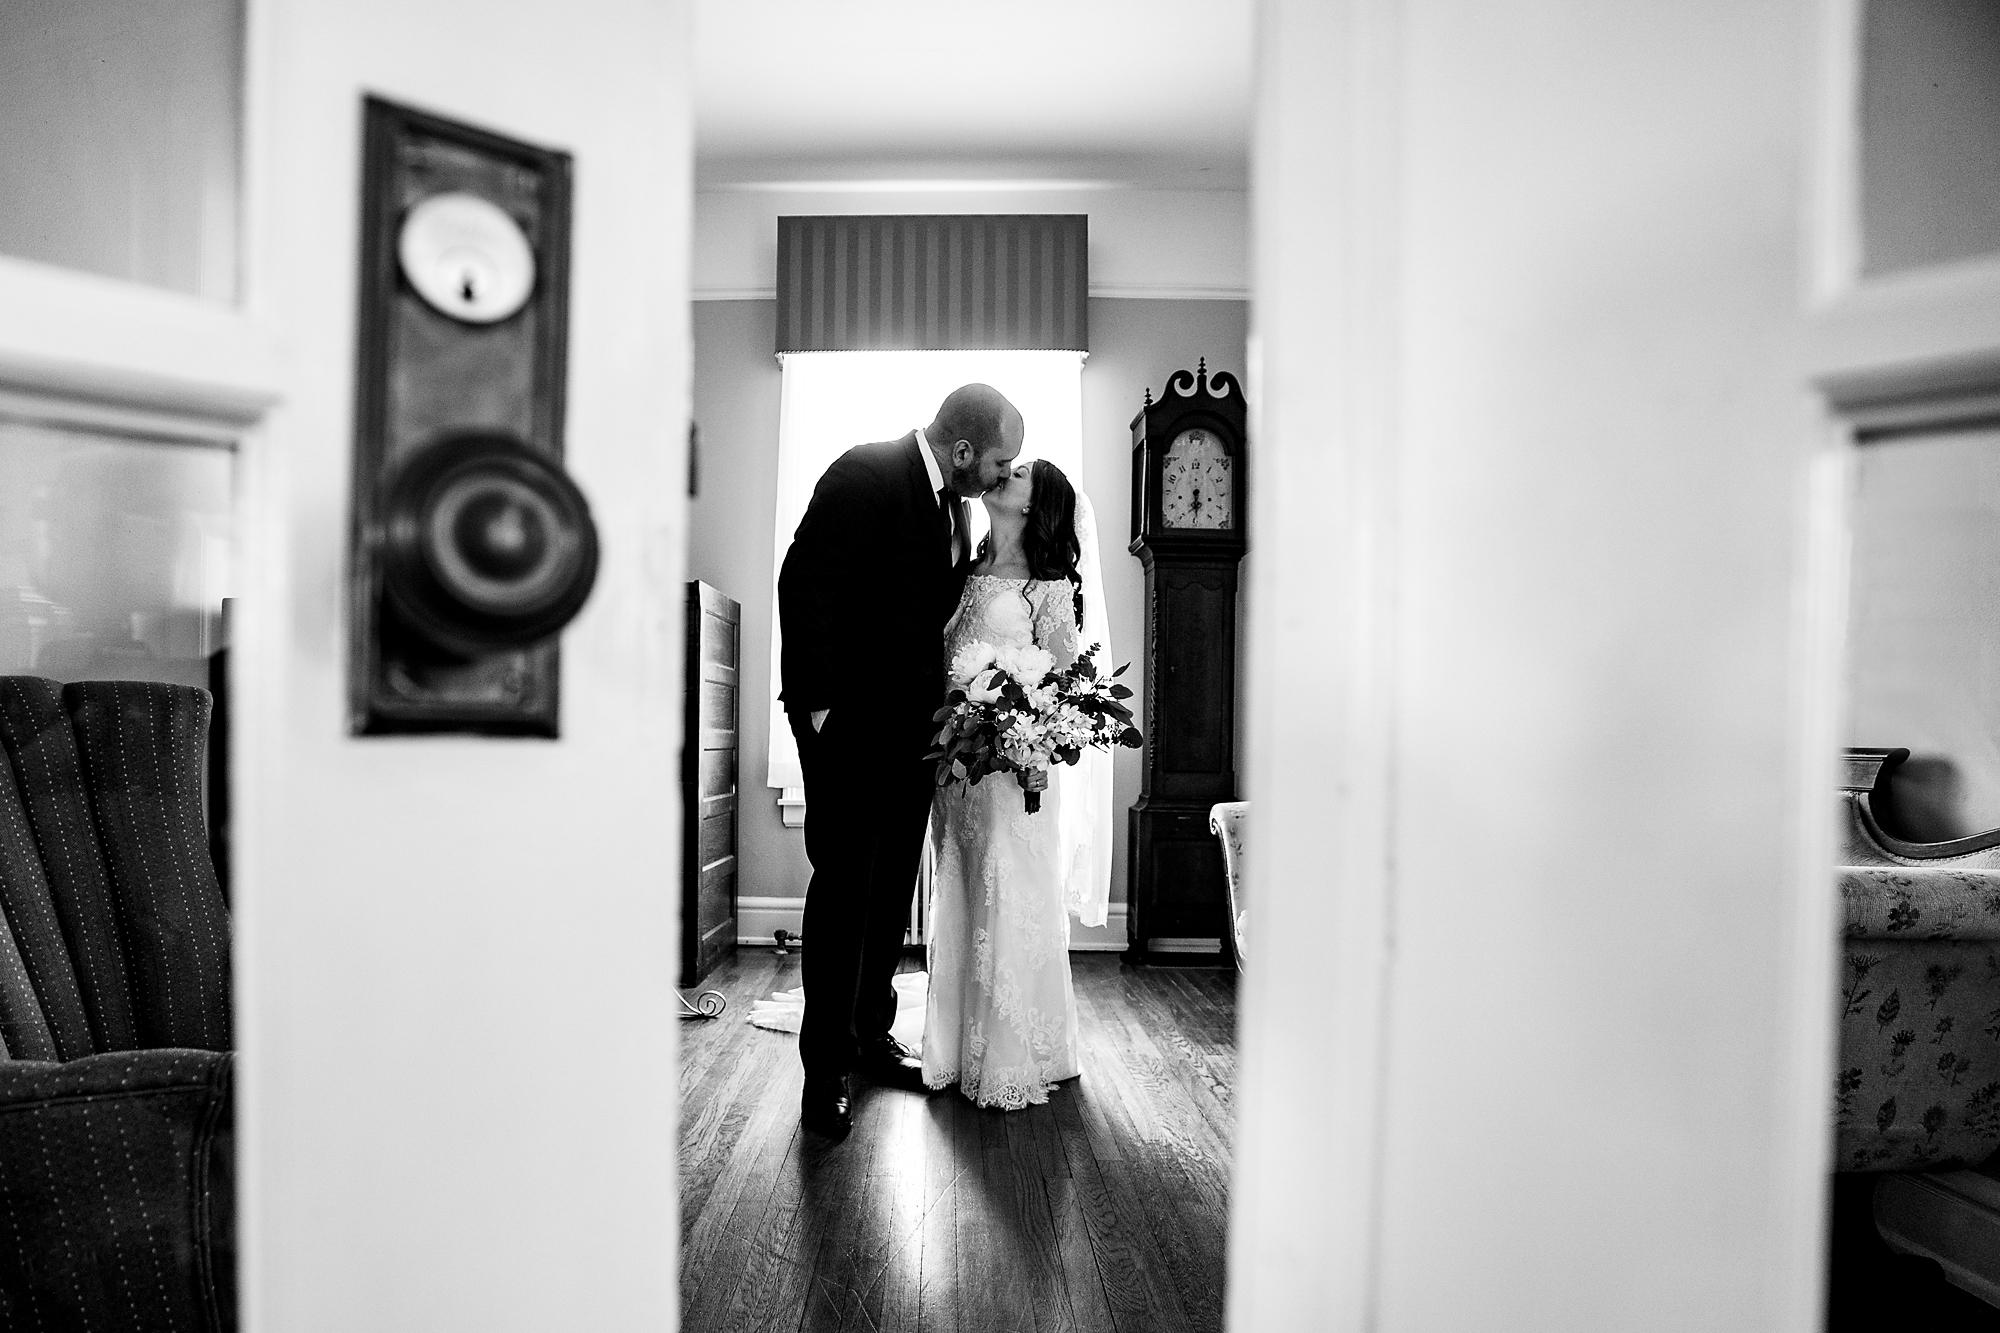 Oxford-Community-Arts-Center-Wedding-Photography-8.jpg